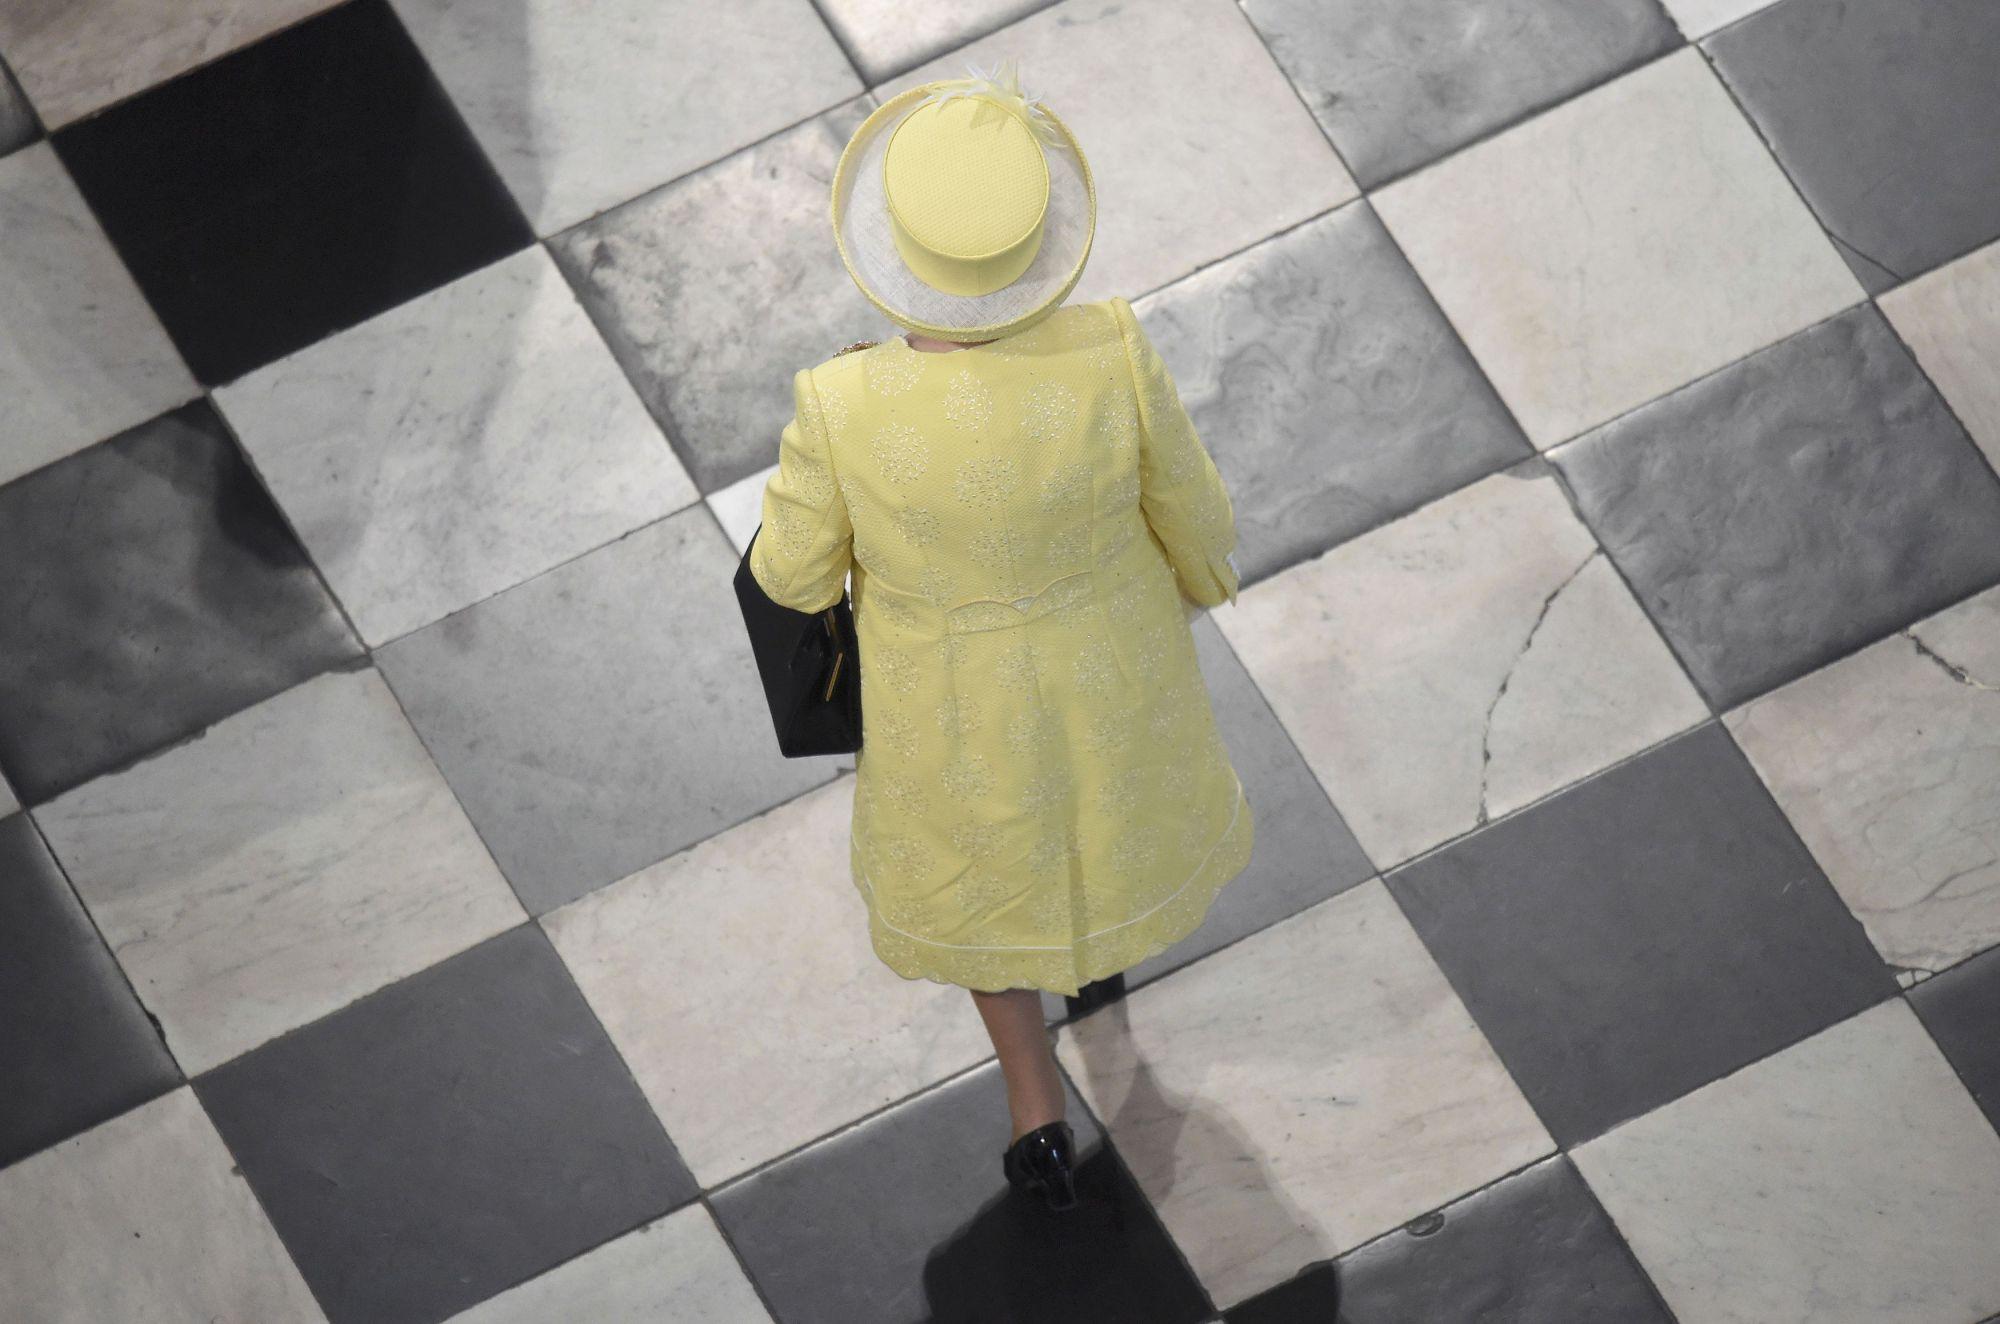 Queen Elizabeth II Made A Surprise Visit To London Fashion Week